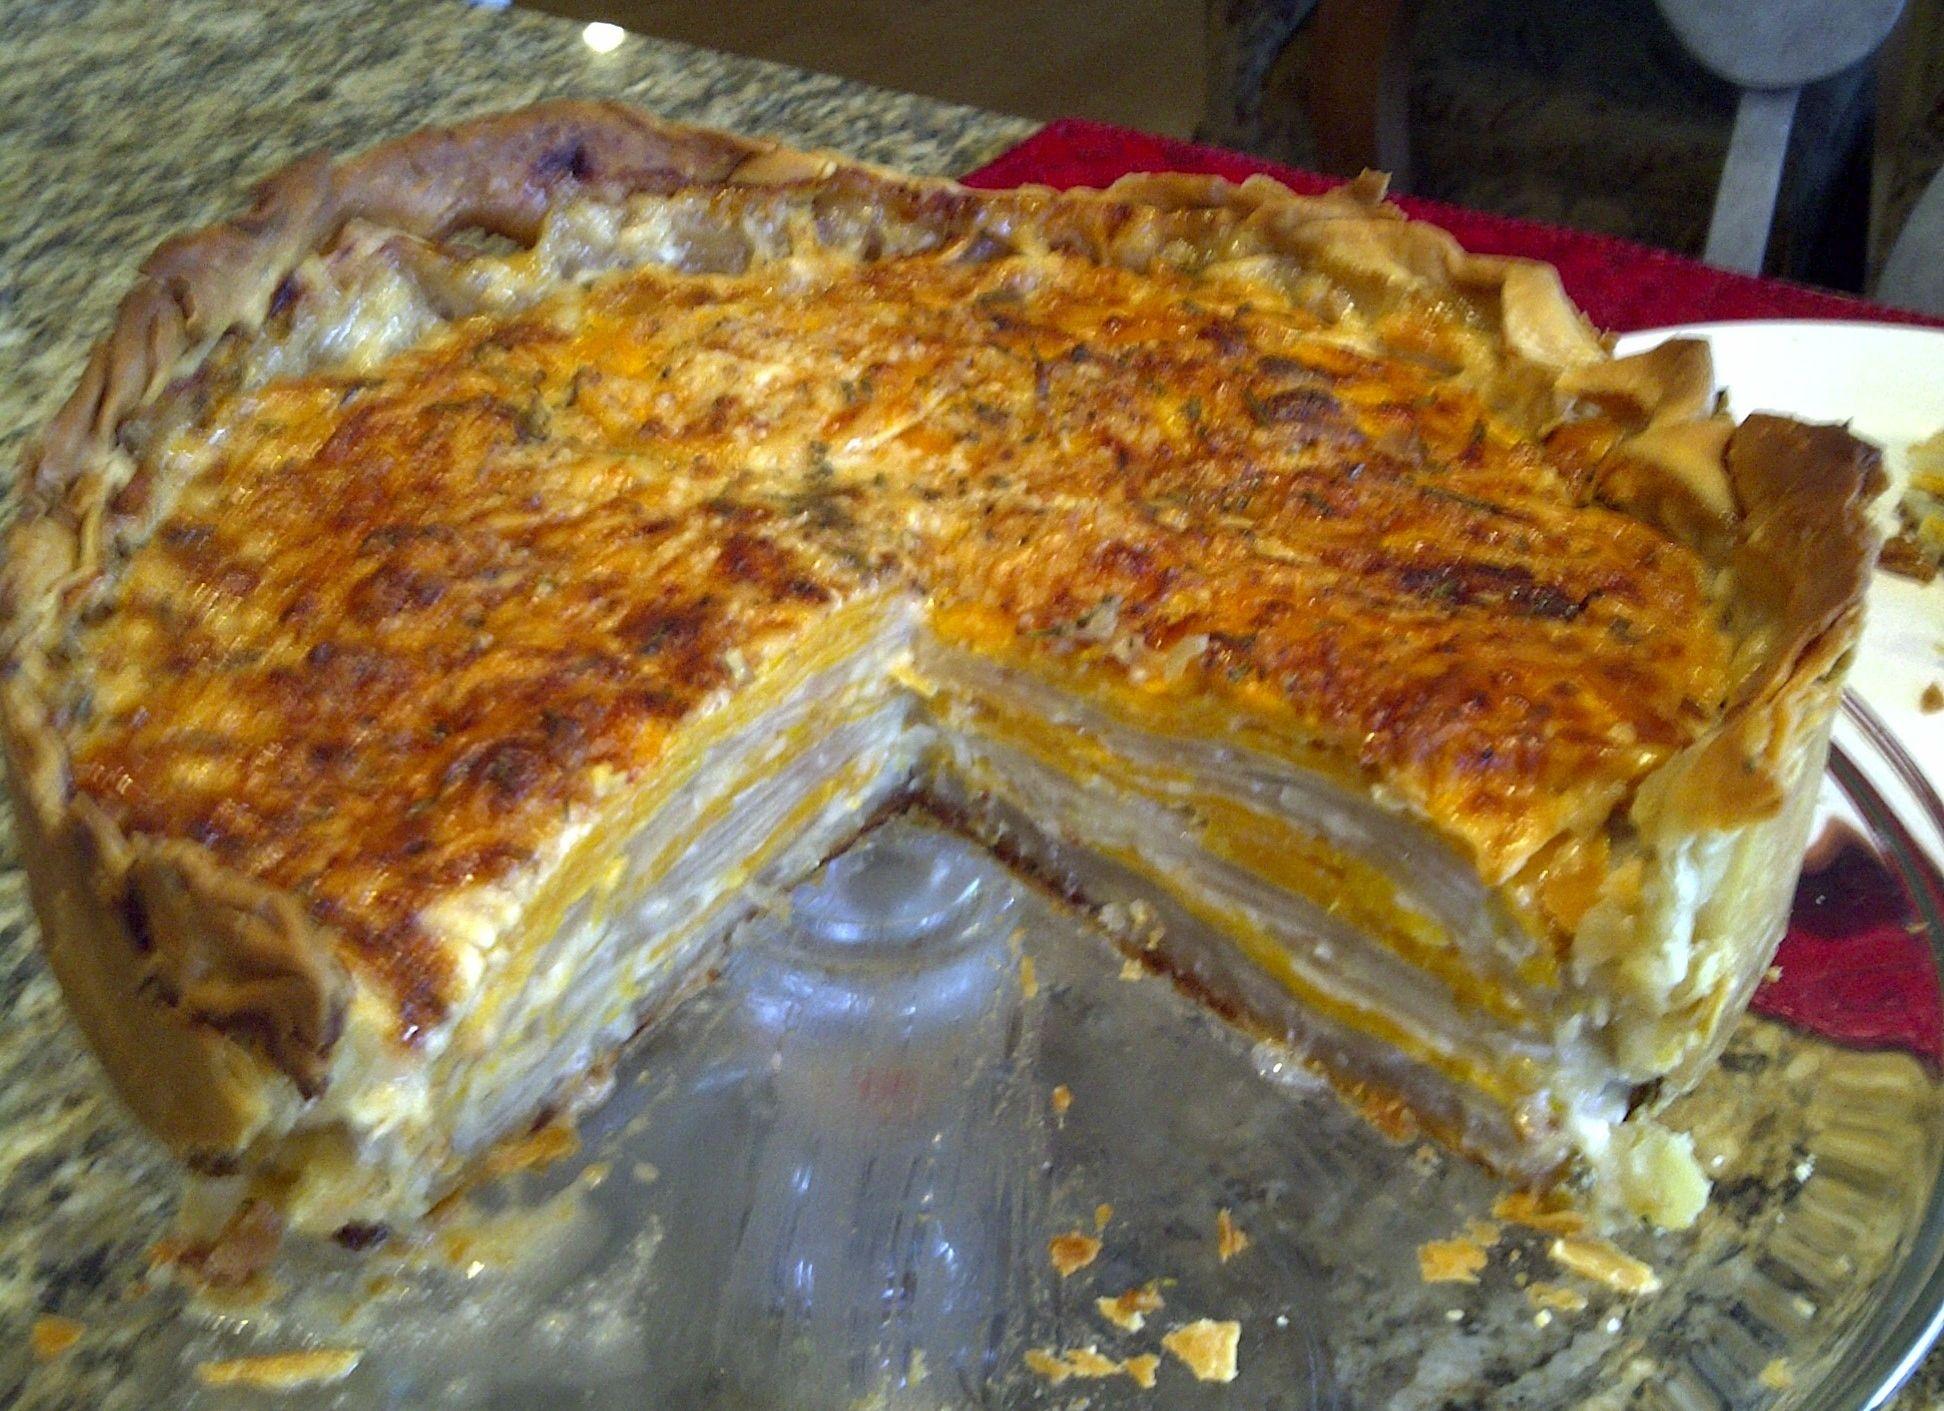 Sweet Potato and Russet Potato bake #russetpotatorecipes